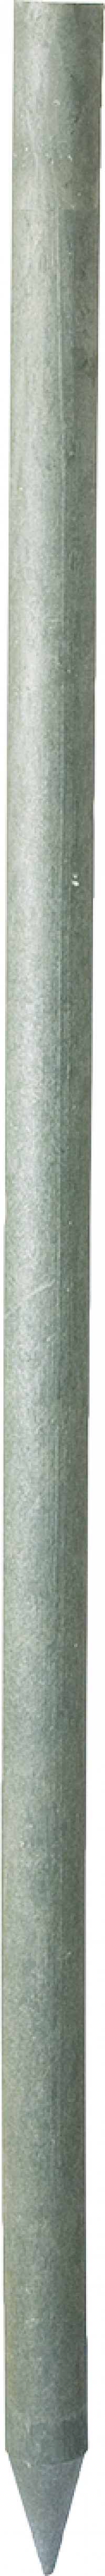 Kunststoffen weidepaal 175 cm lang, 6 cm sterk, rond